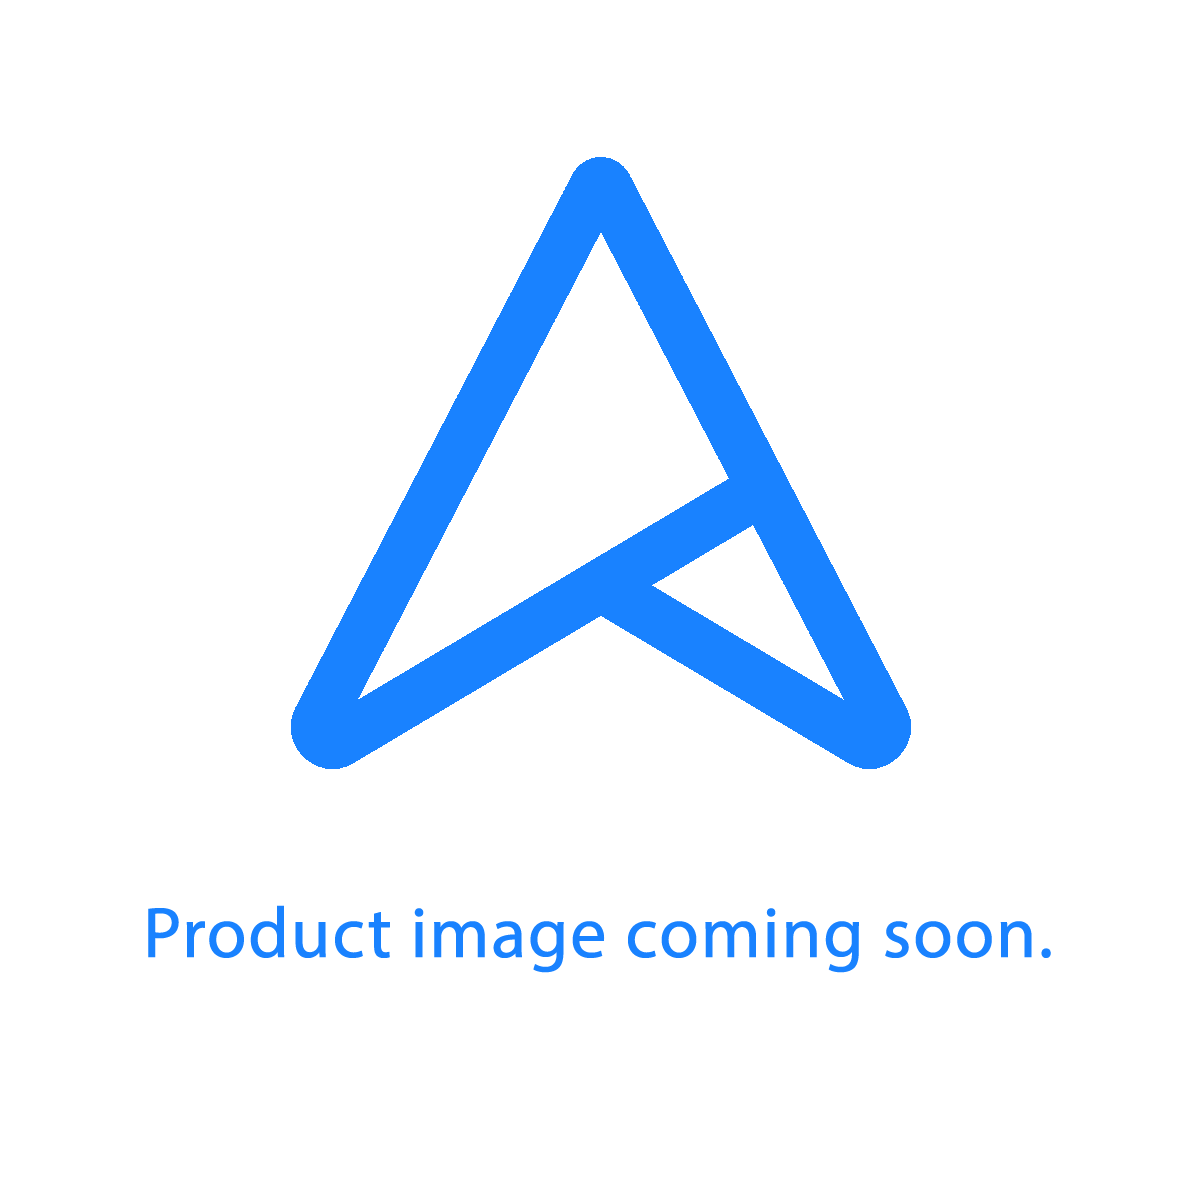 ASUS Vivobook 14 M415UA-EK047T